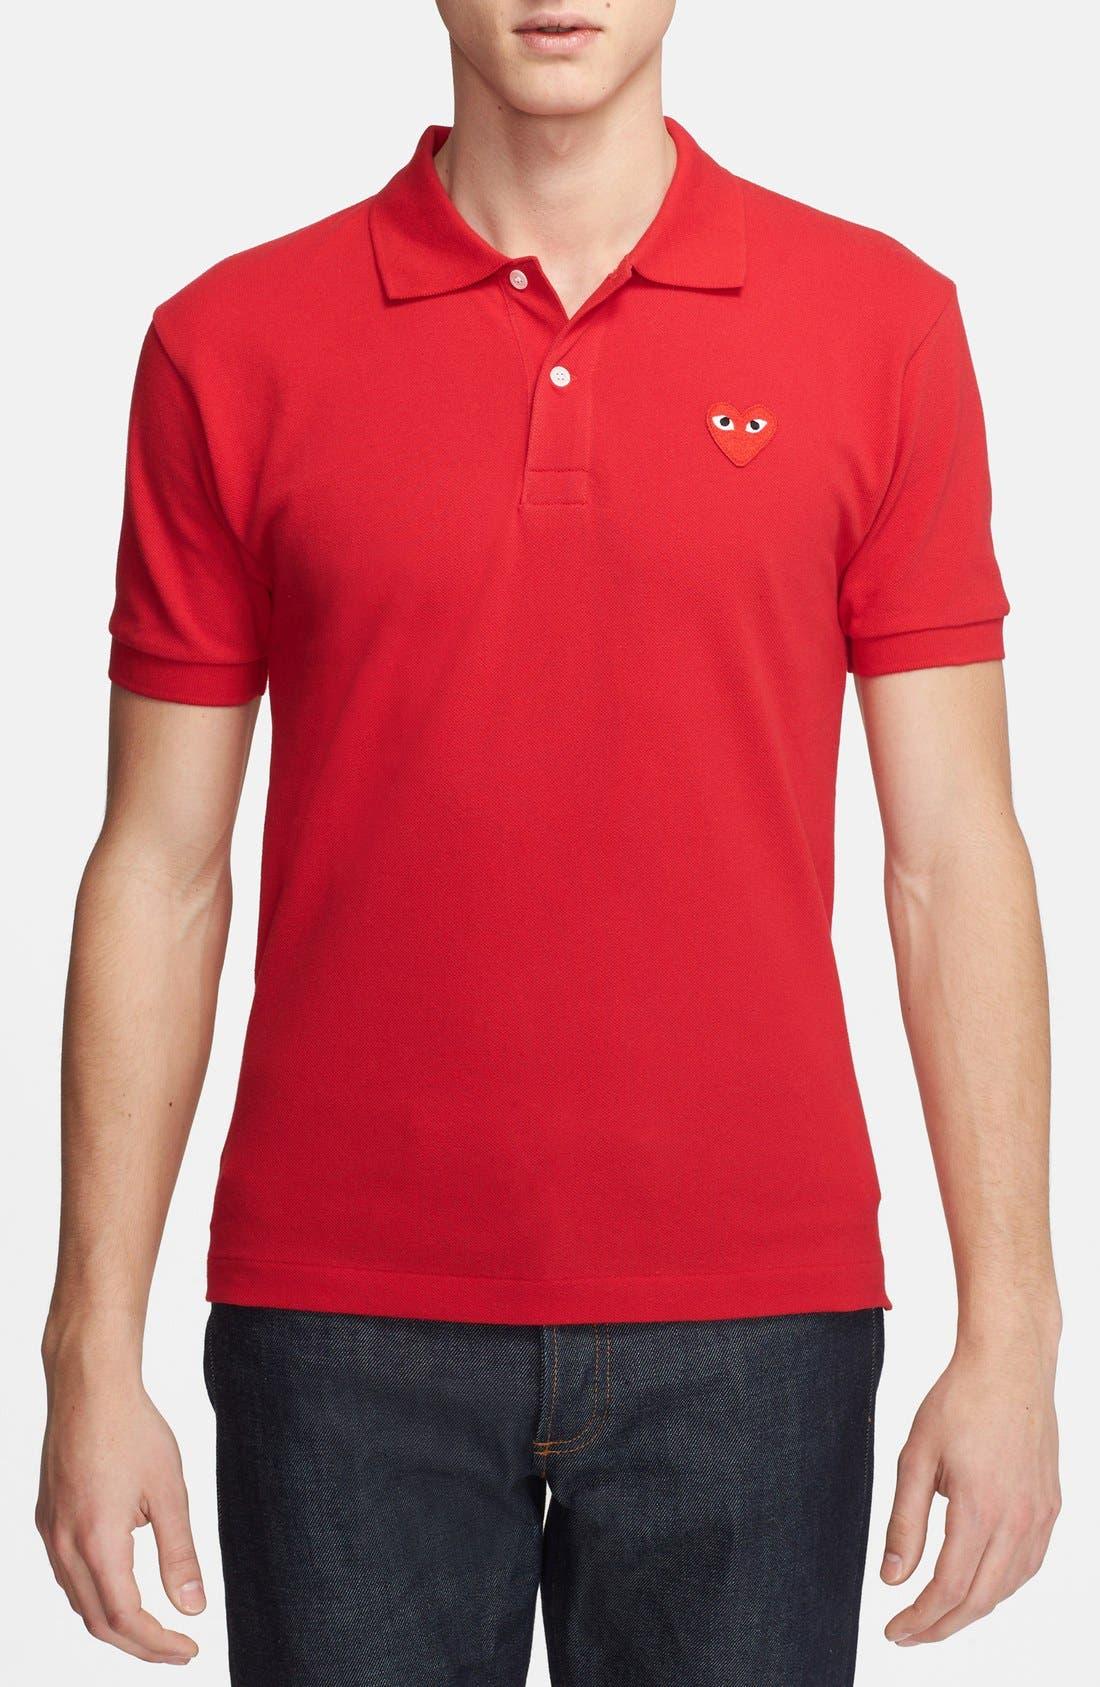 Comme des Garçons PLAY Piqué Polo with Heart Appliqué,                         Main,                         color, Red